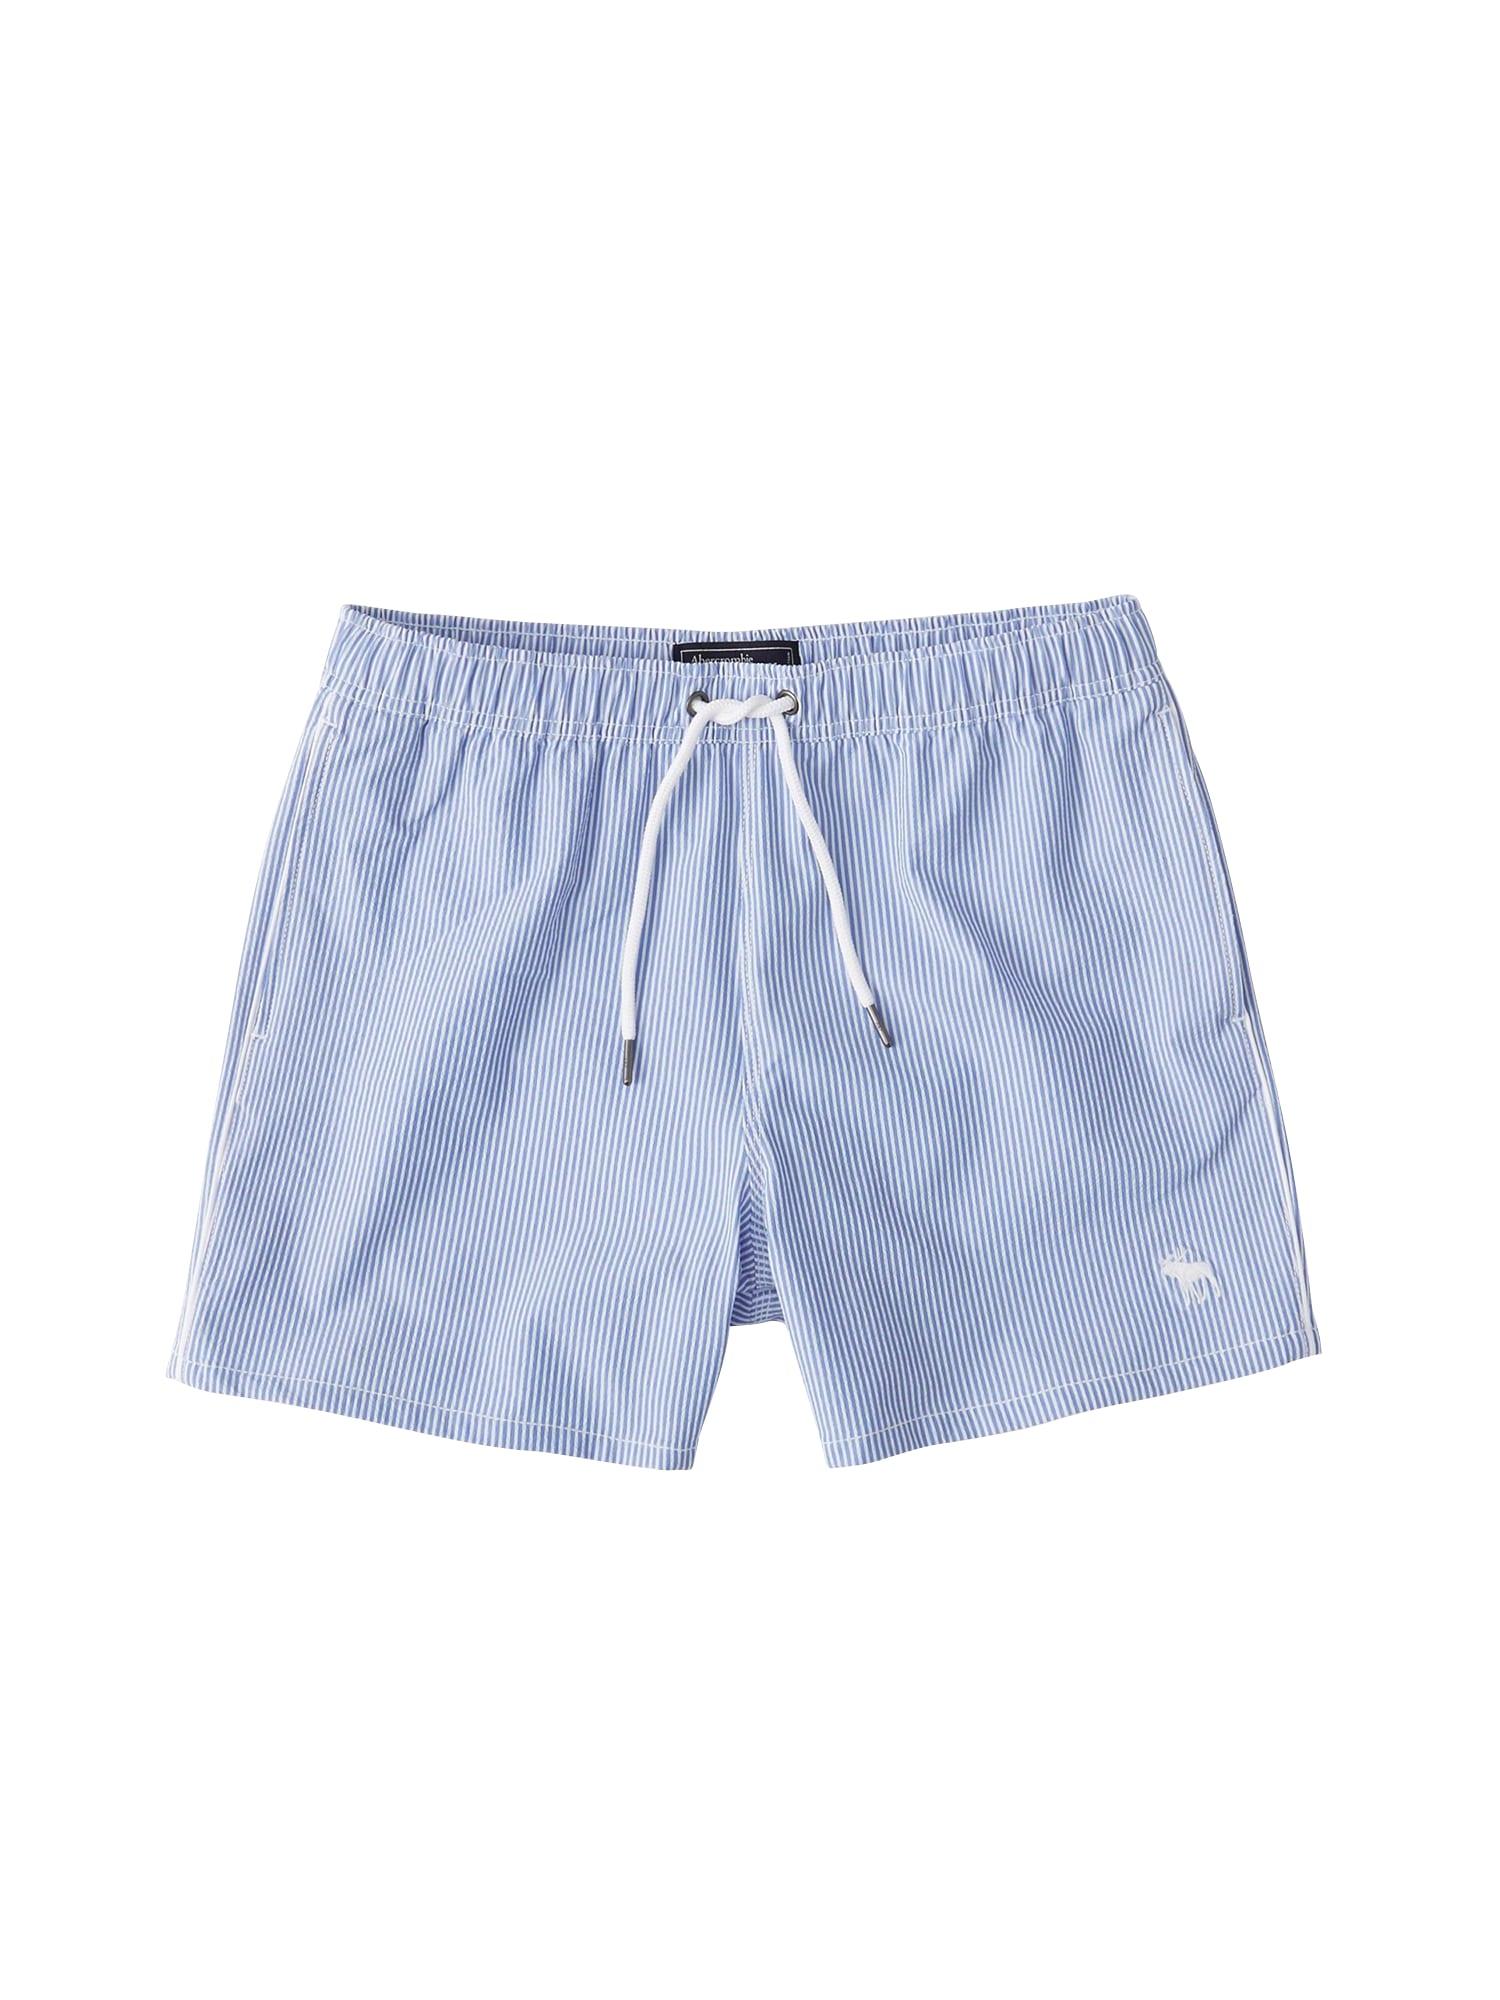 Plavecké šortky (S-EF148) SB19-5 INCH PATTERN SEERSUCKER 1CC $48 modrá Abercrombie & Fitch